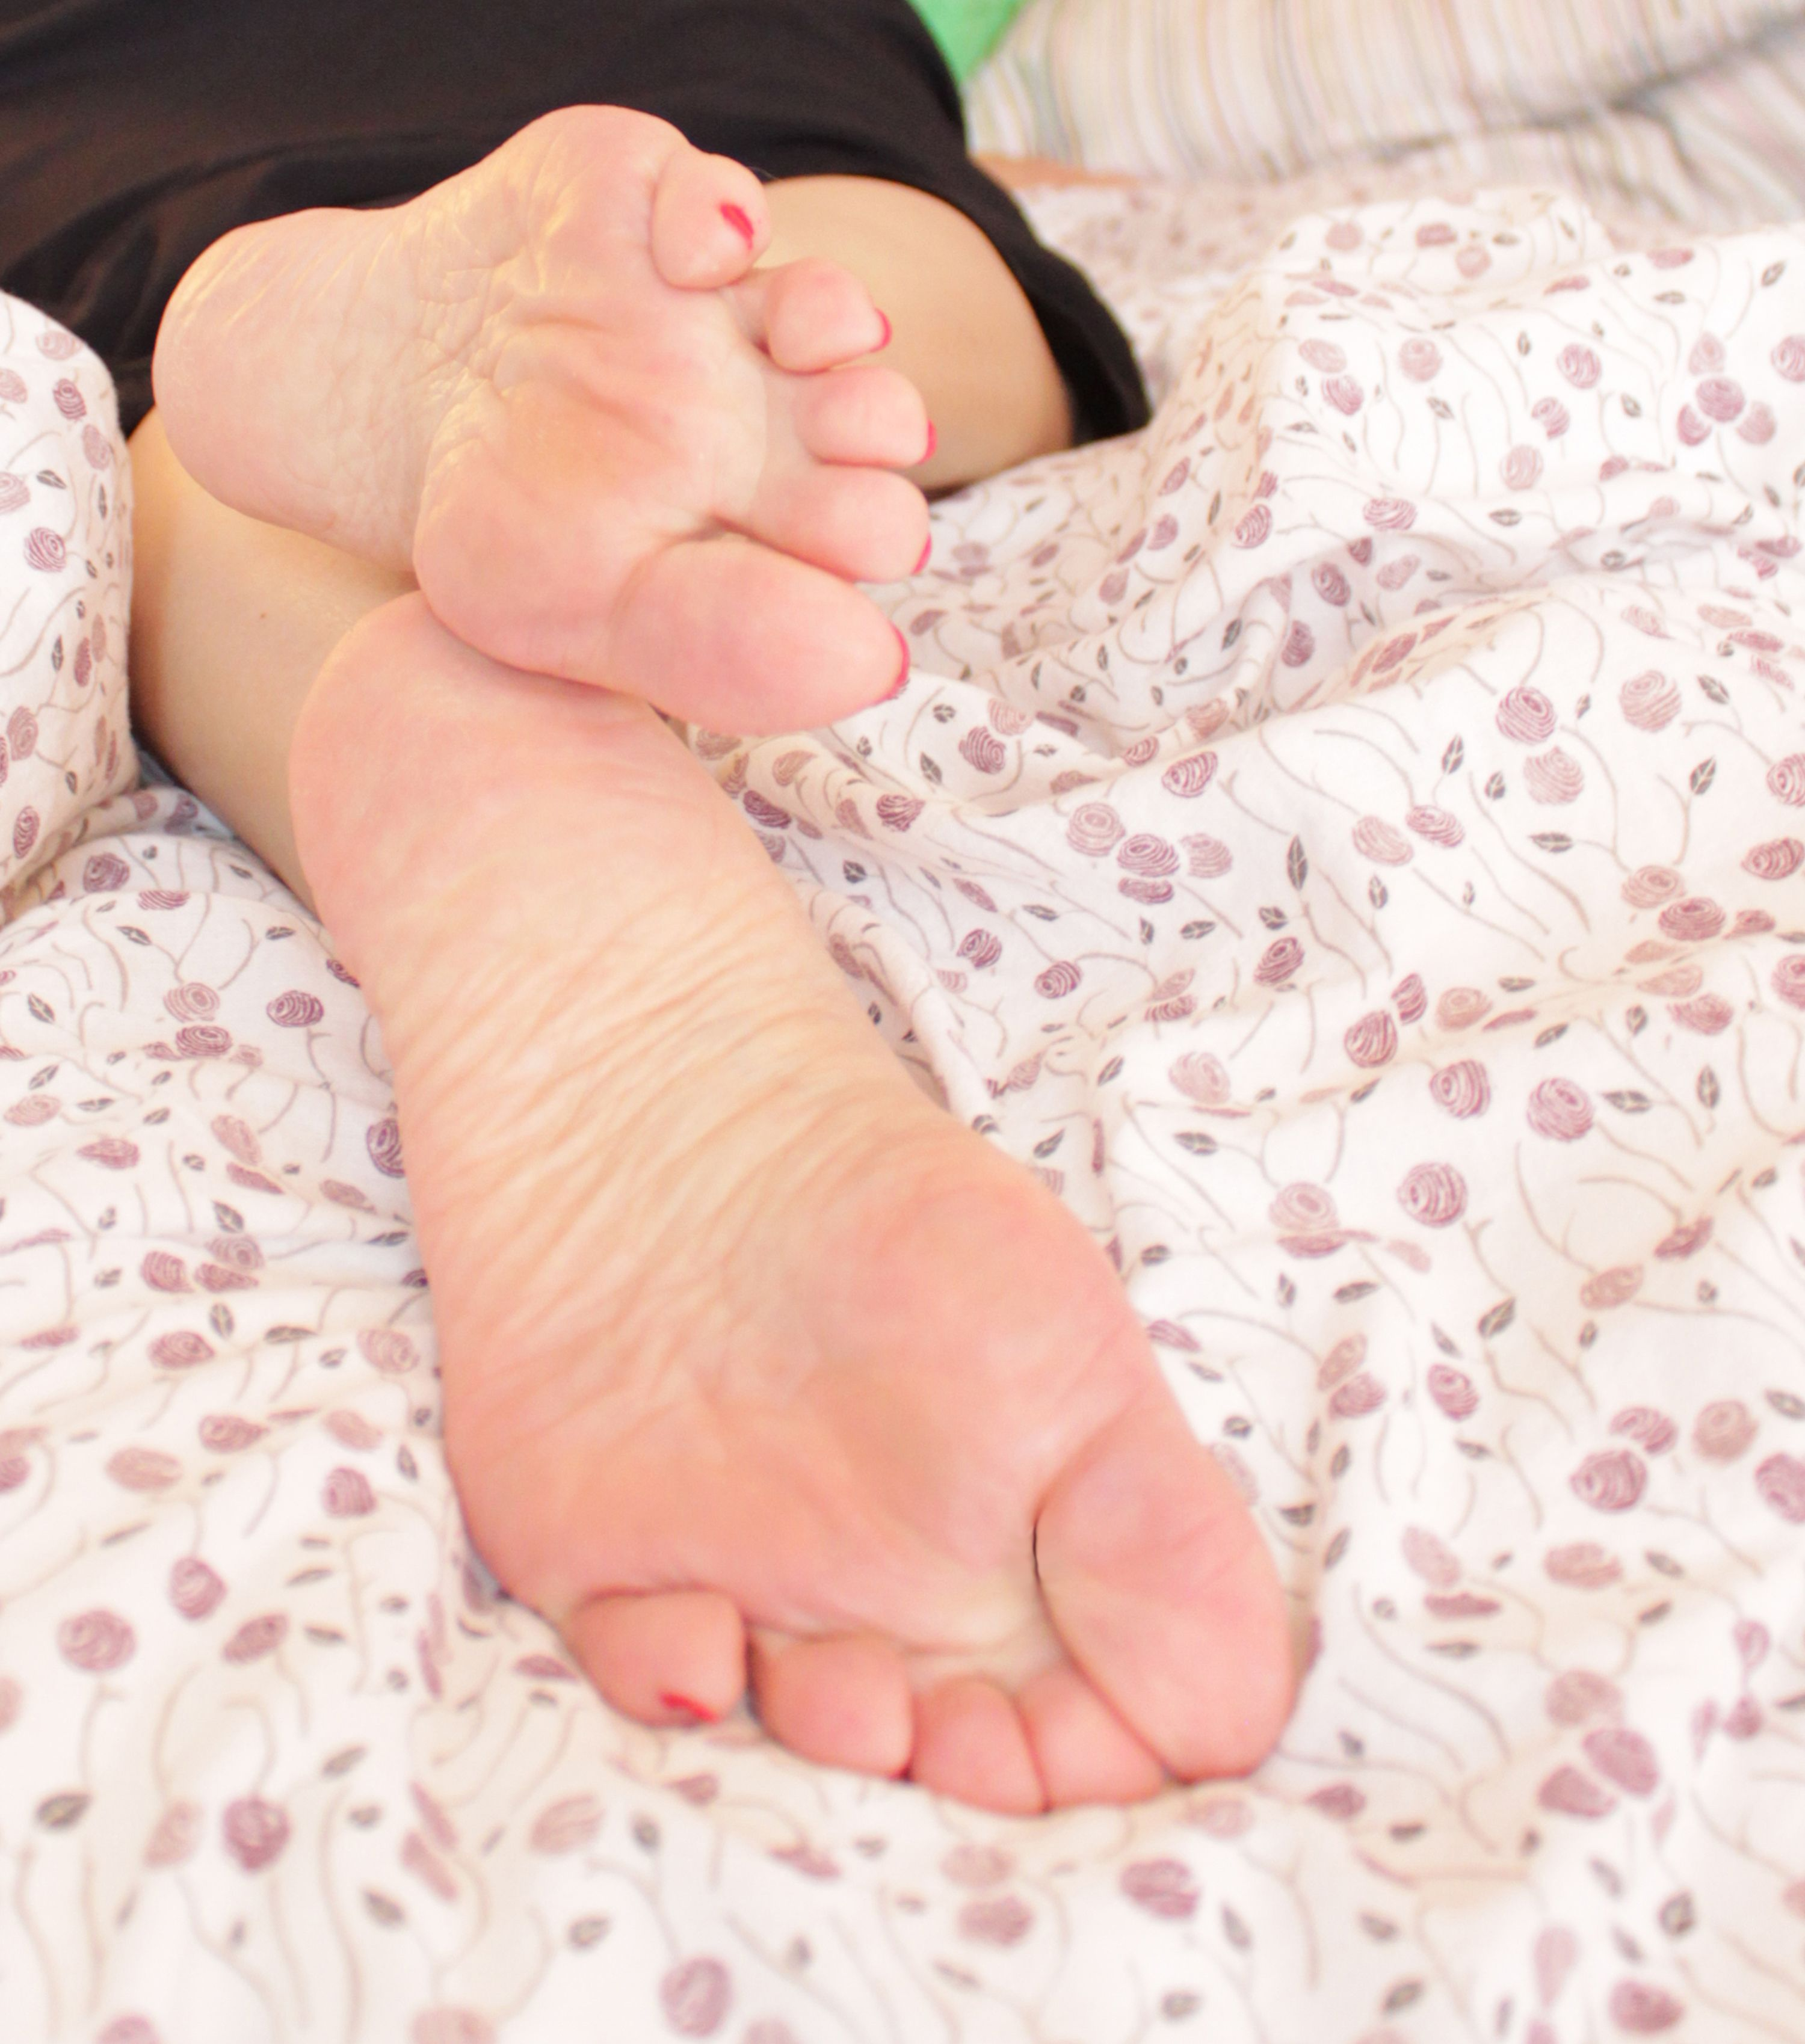 Nylon Füße Lecken